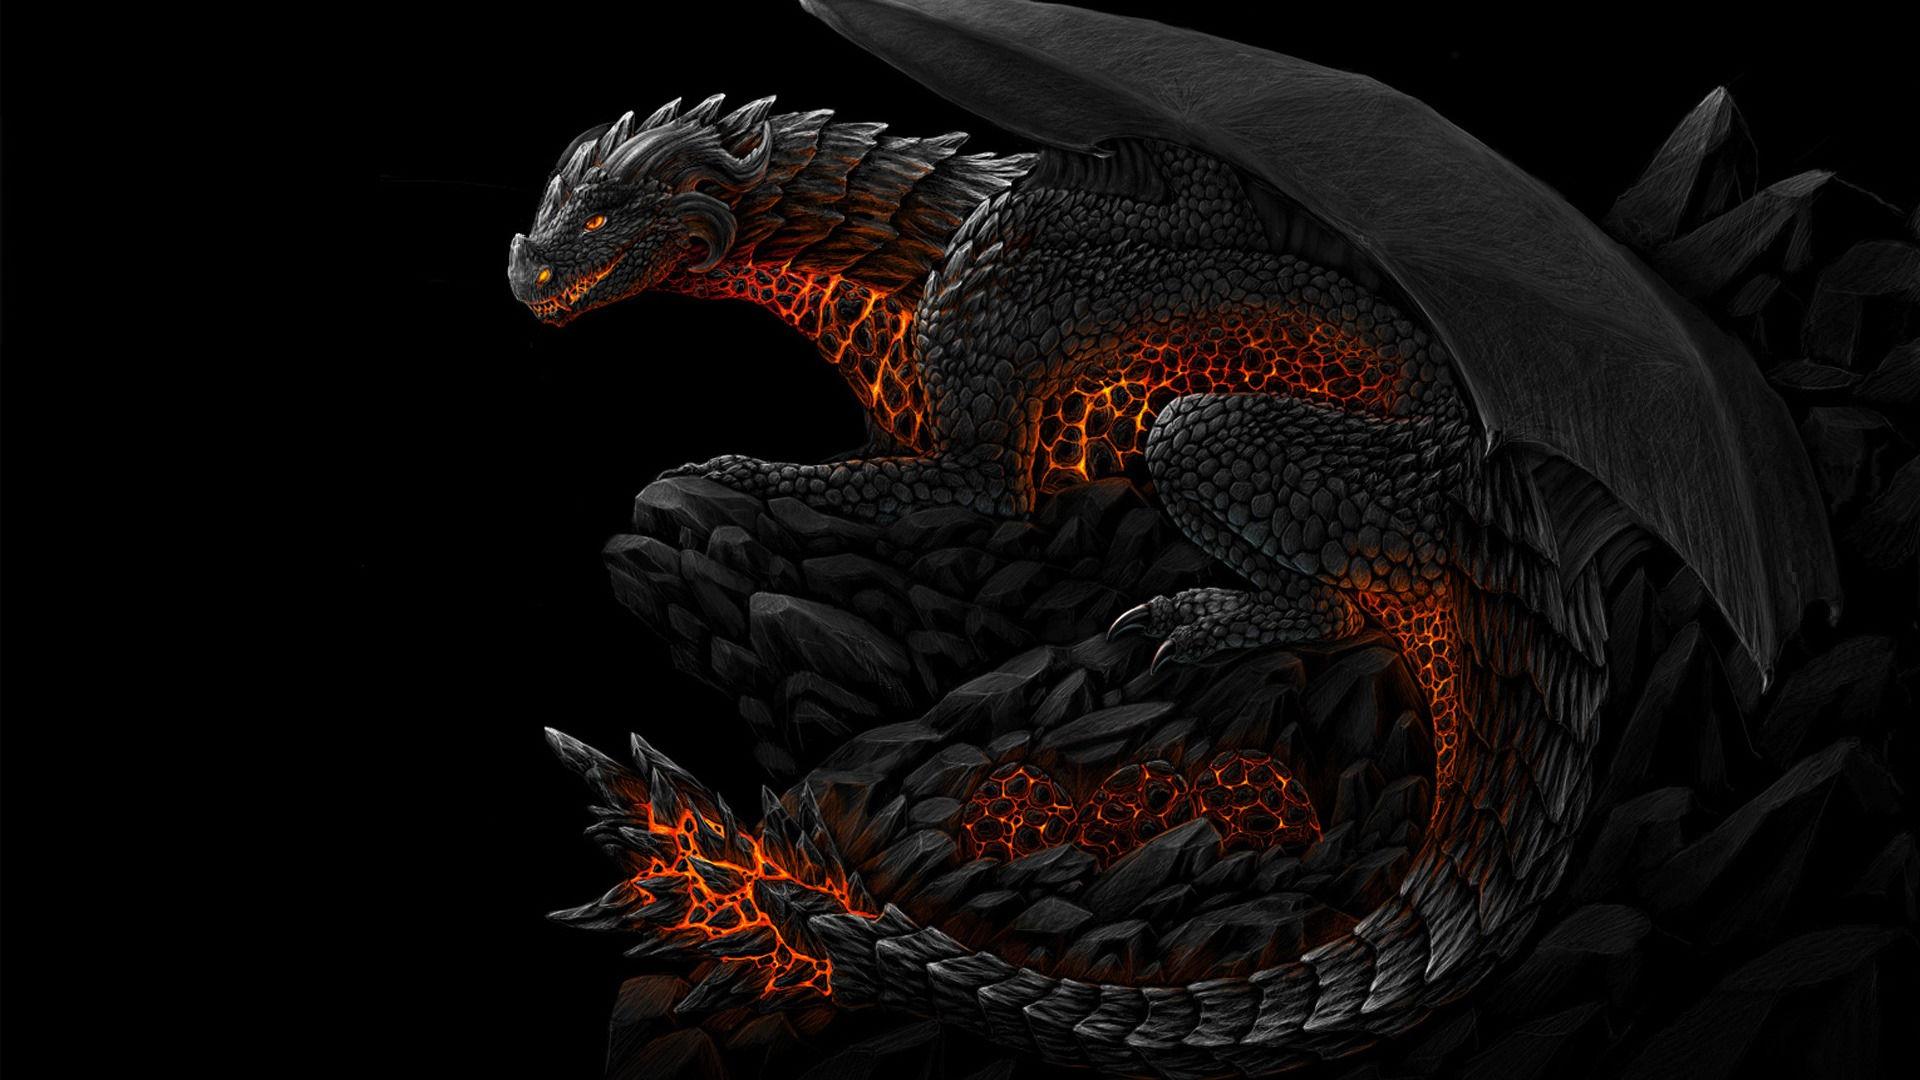 Dark-Dragon-DArk-Dragon-Fire-With-Resolutions-1920%C3%971080-Pixel-wallpaper-wp3404439